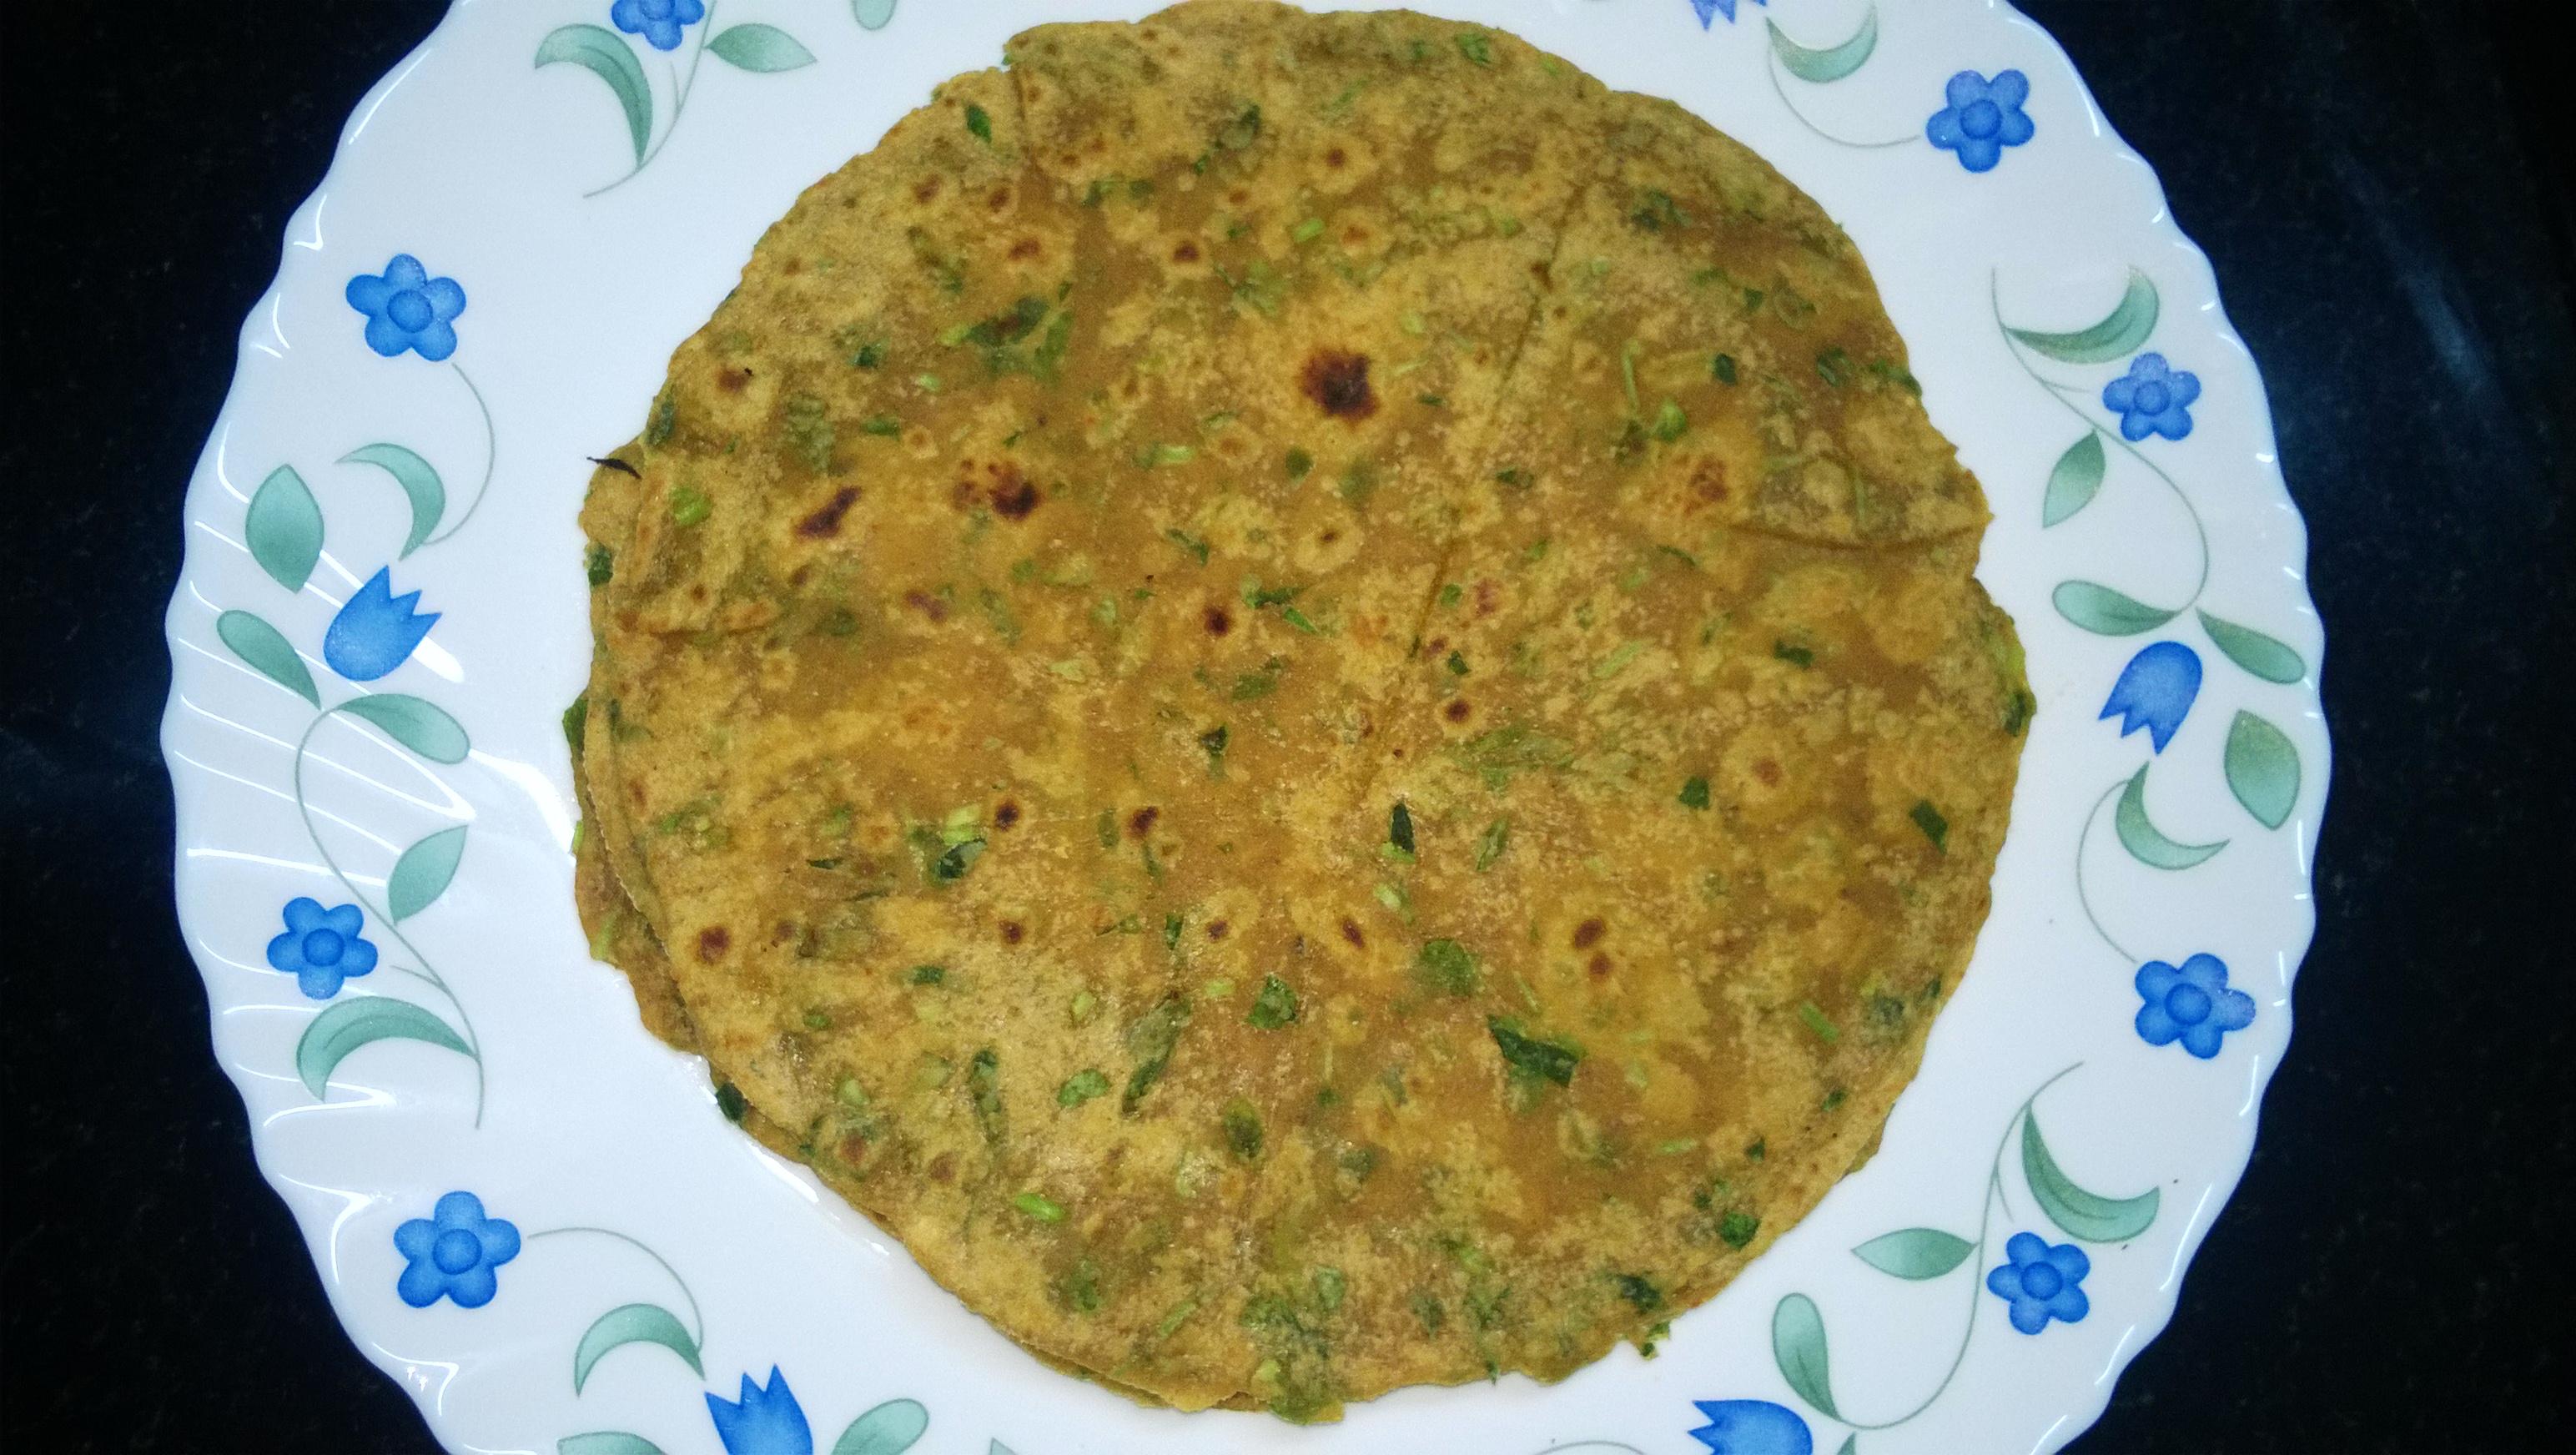 Spiced Methi Paratha